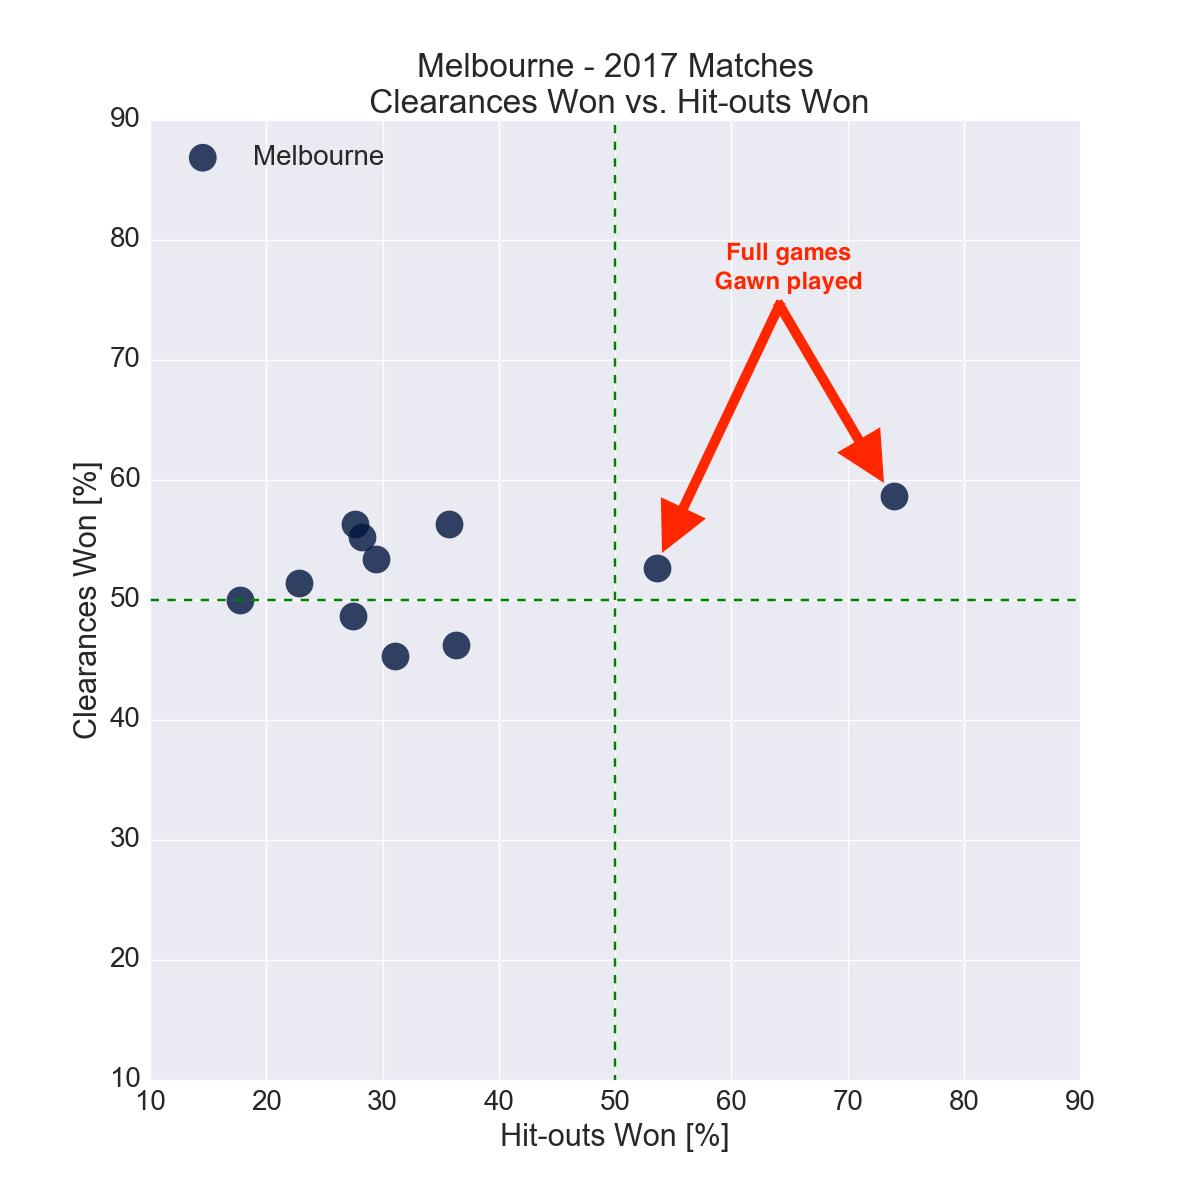 Figure-2: Melbourne in 2017 – Clearances Won vs. Hit-outs Won